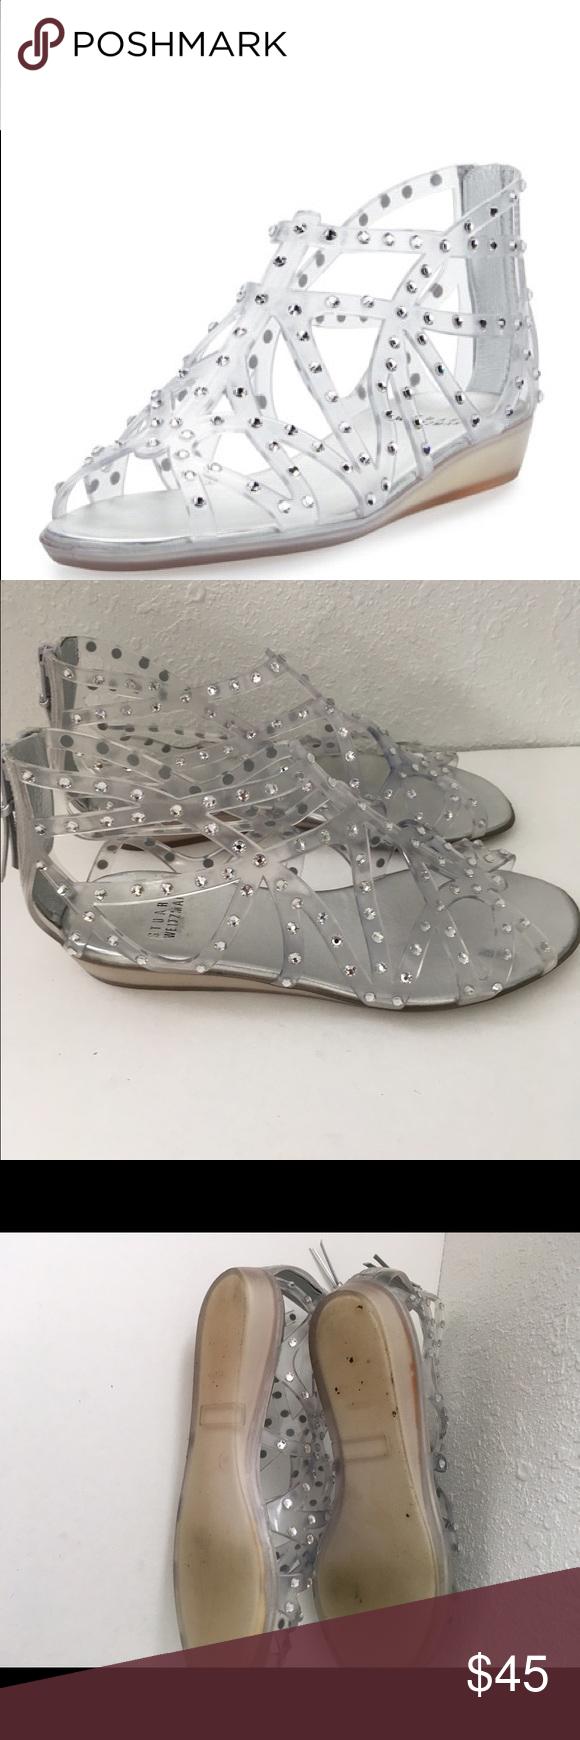 02c19717ee2f Stuart weitzman glogladius jelly sandals 39 9 Caged jelly sandals. Worn by  a non smoker. Zip up the back. Size 39 or 9 Stuart Weitzman Shoes Sandals